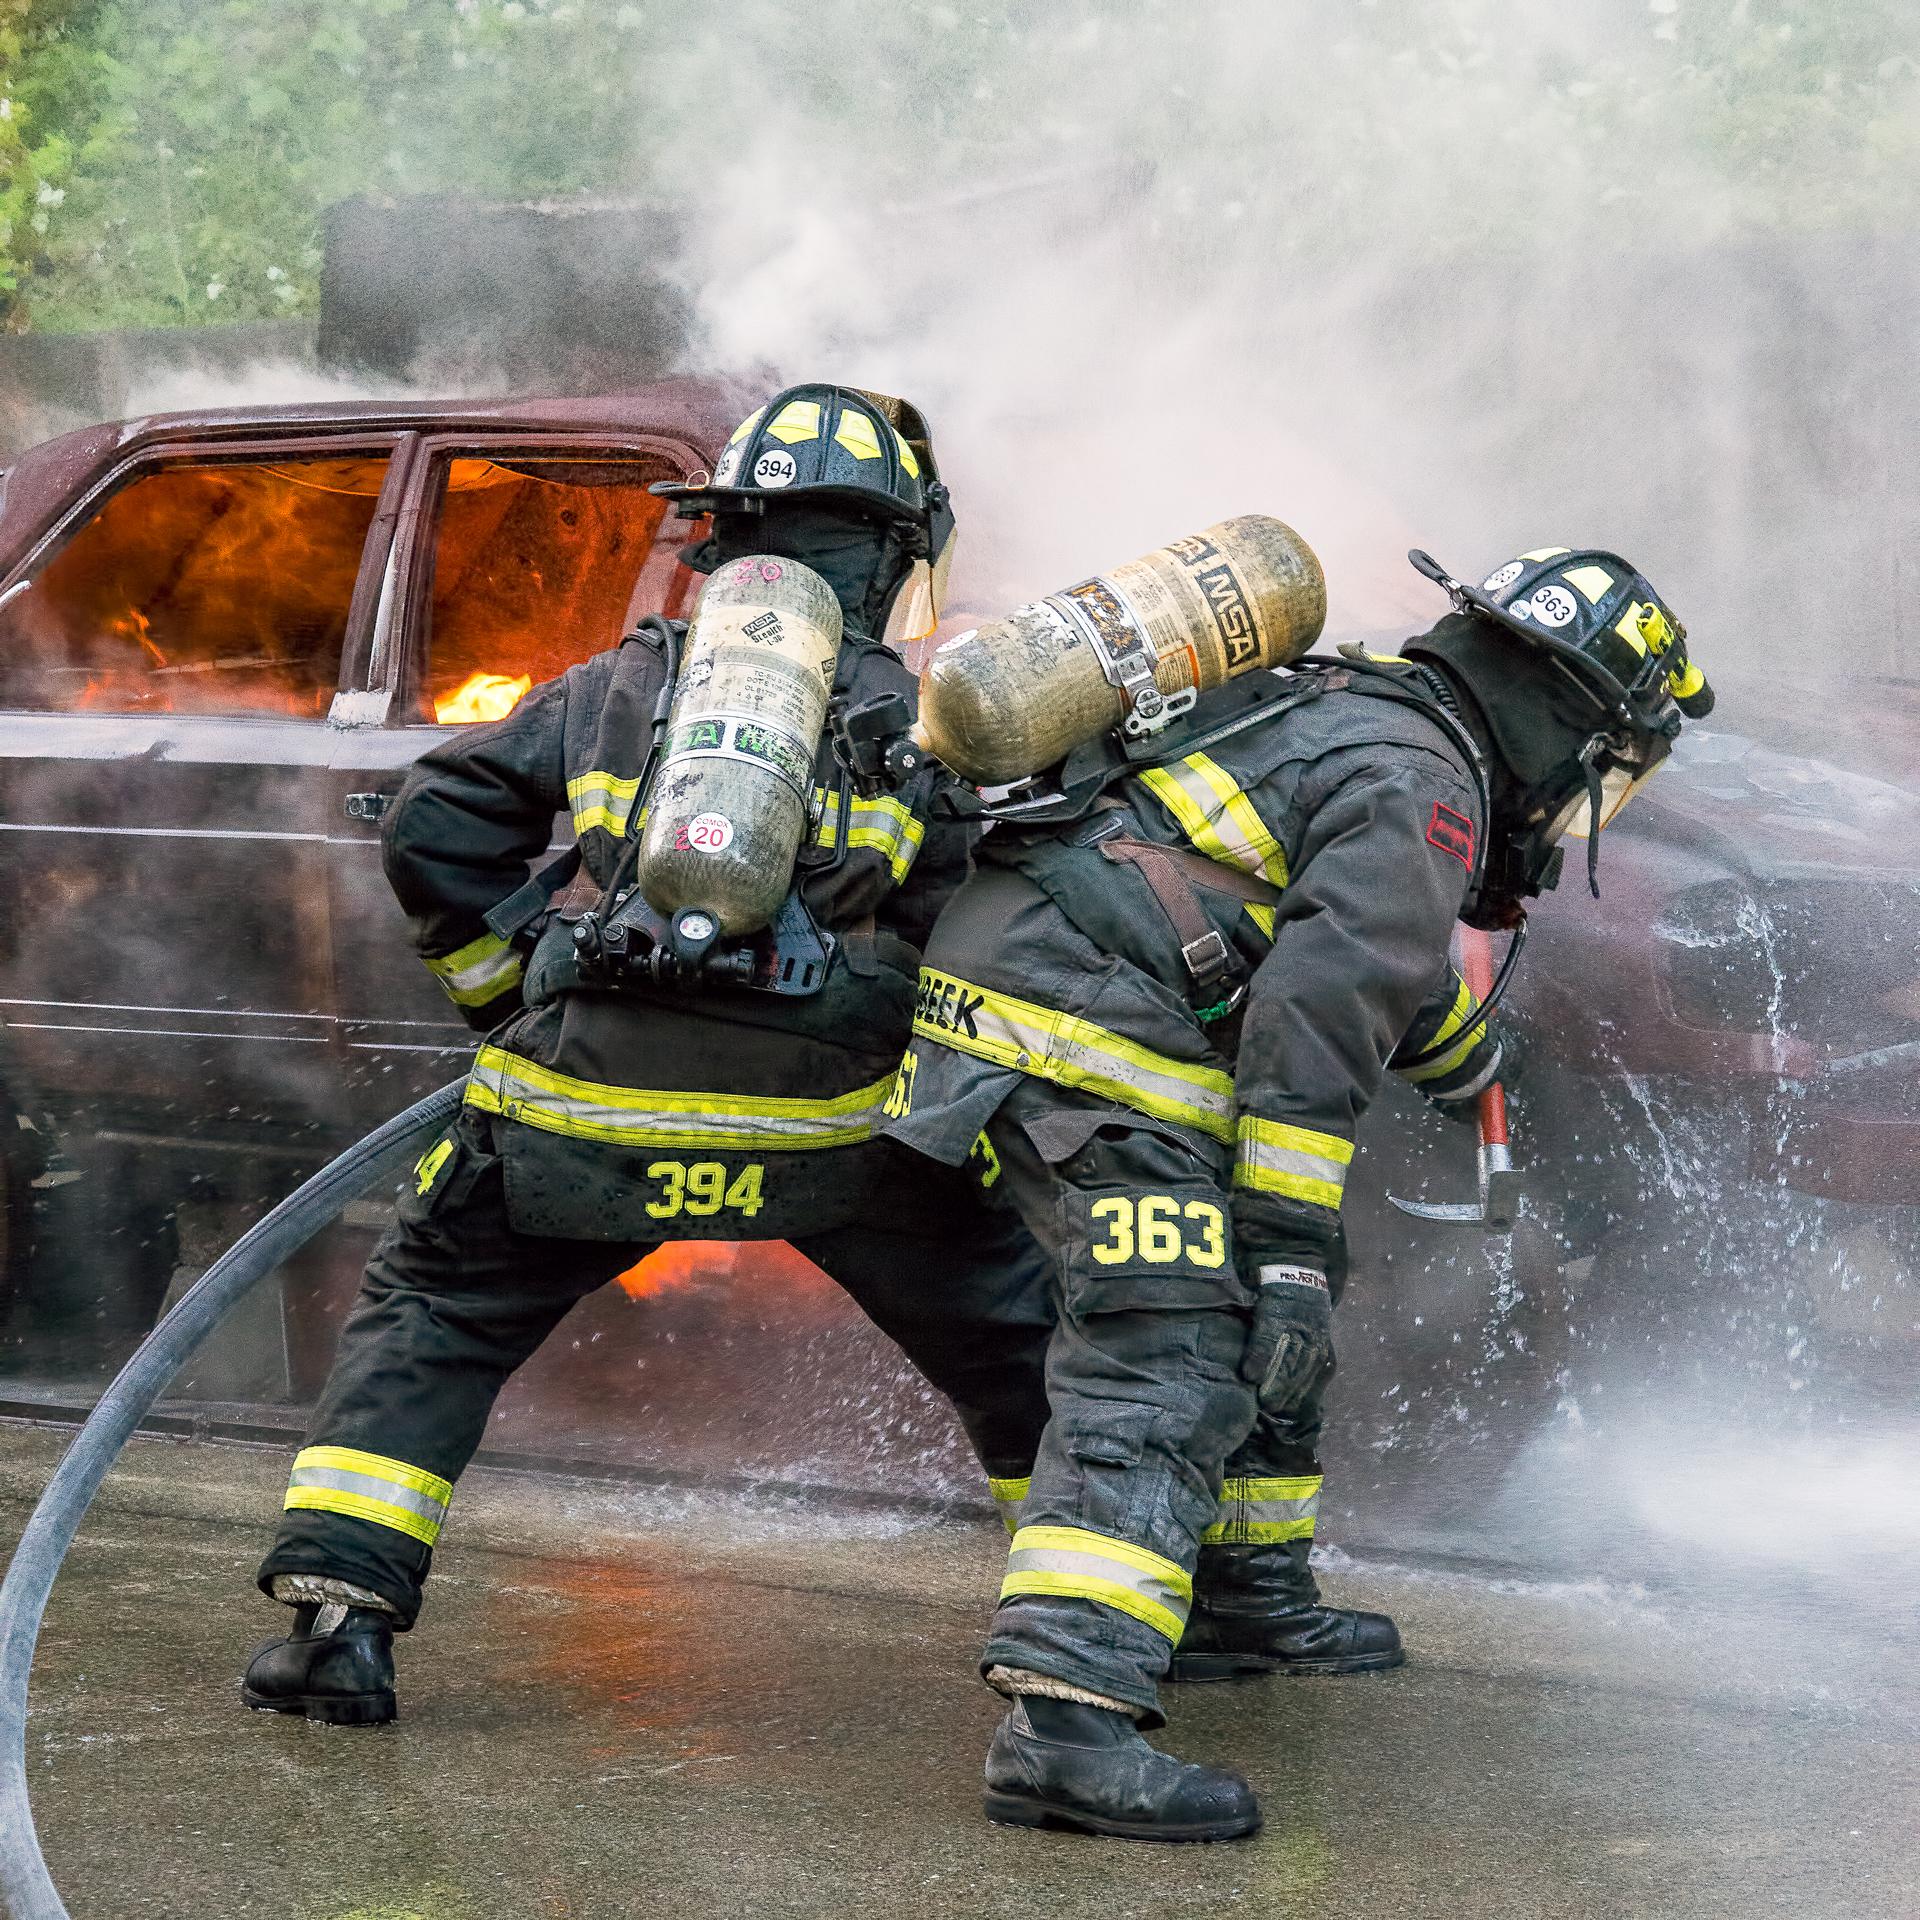 Car fire training prop